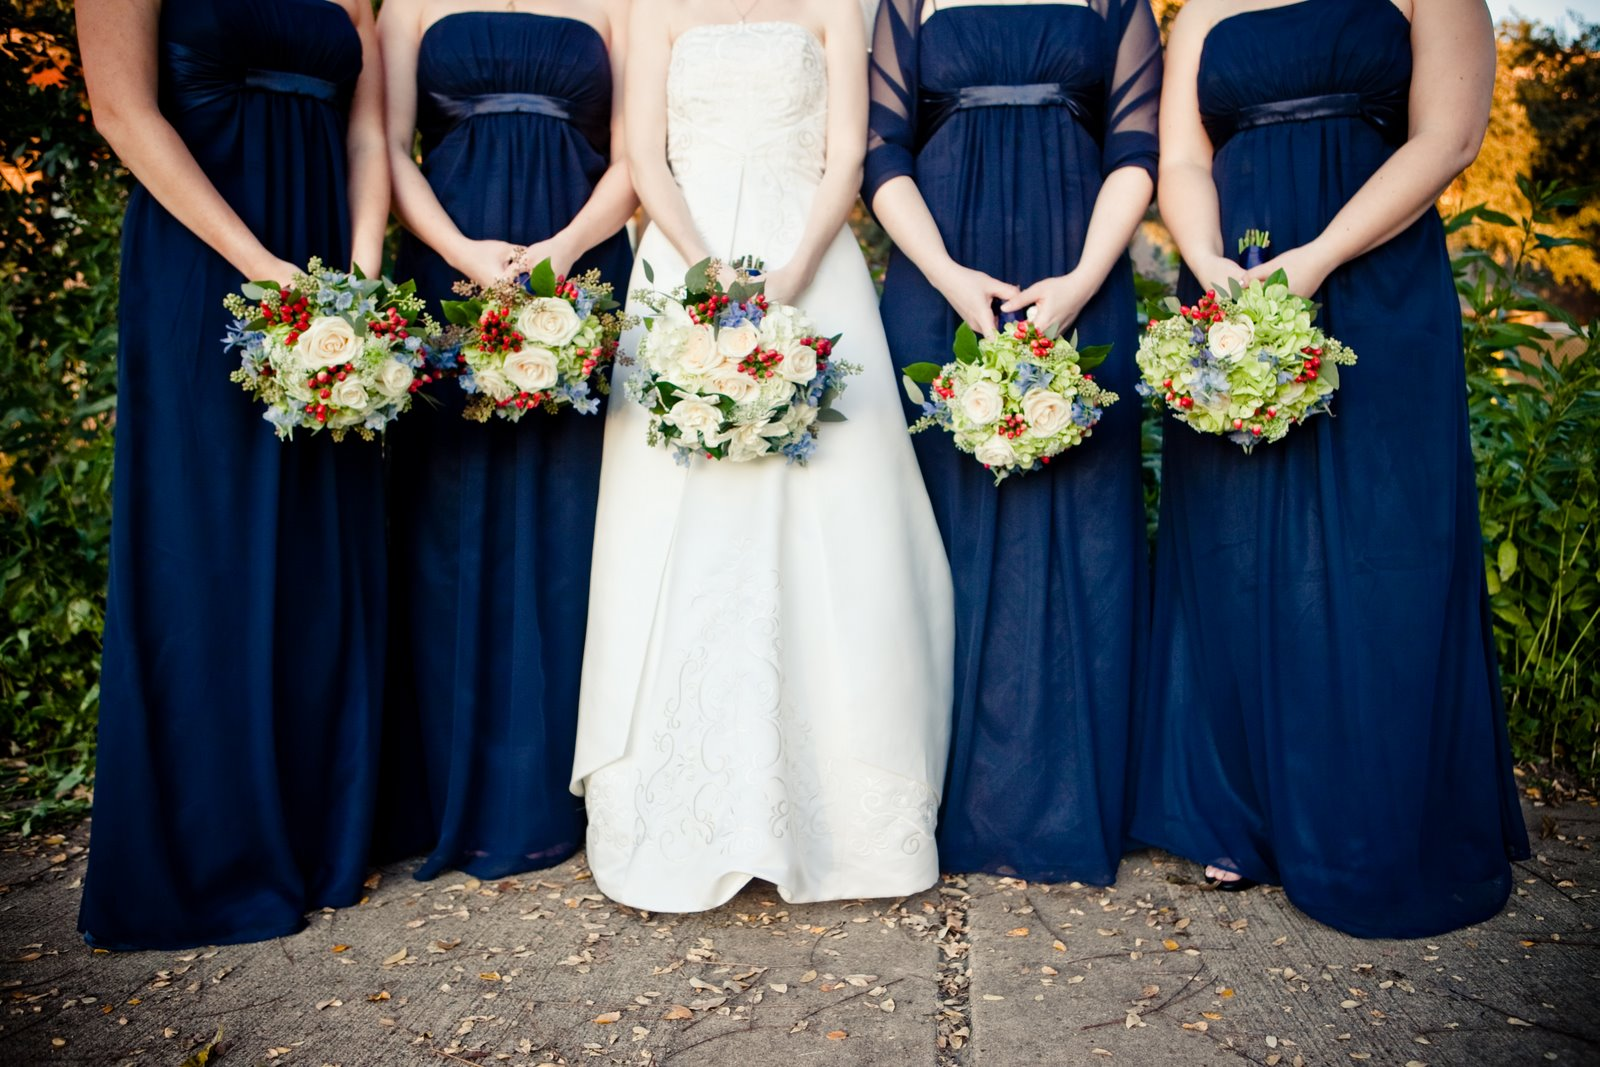 Bouquets of Austin Winter wedding flowers